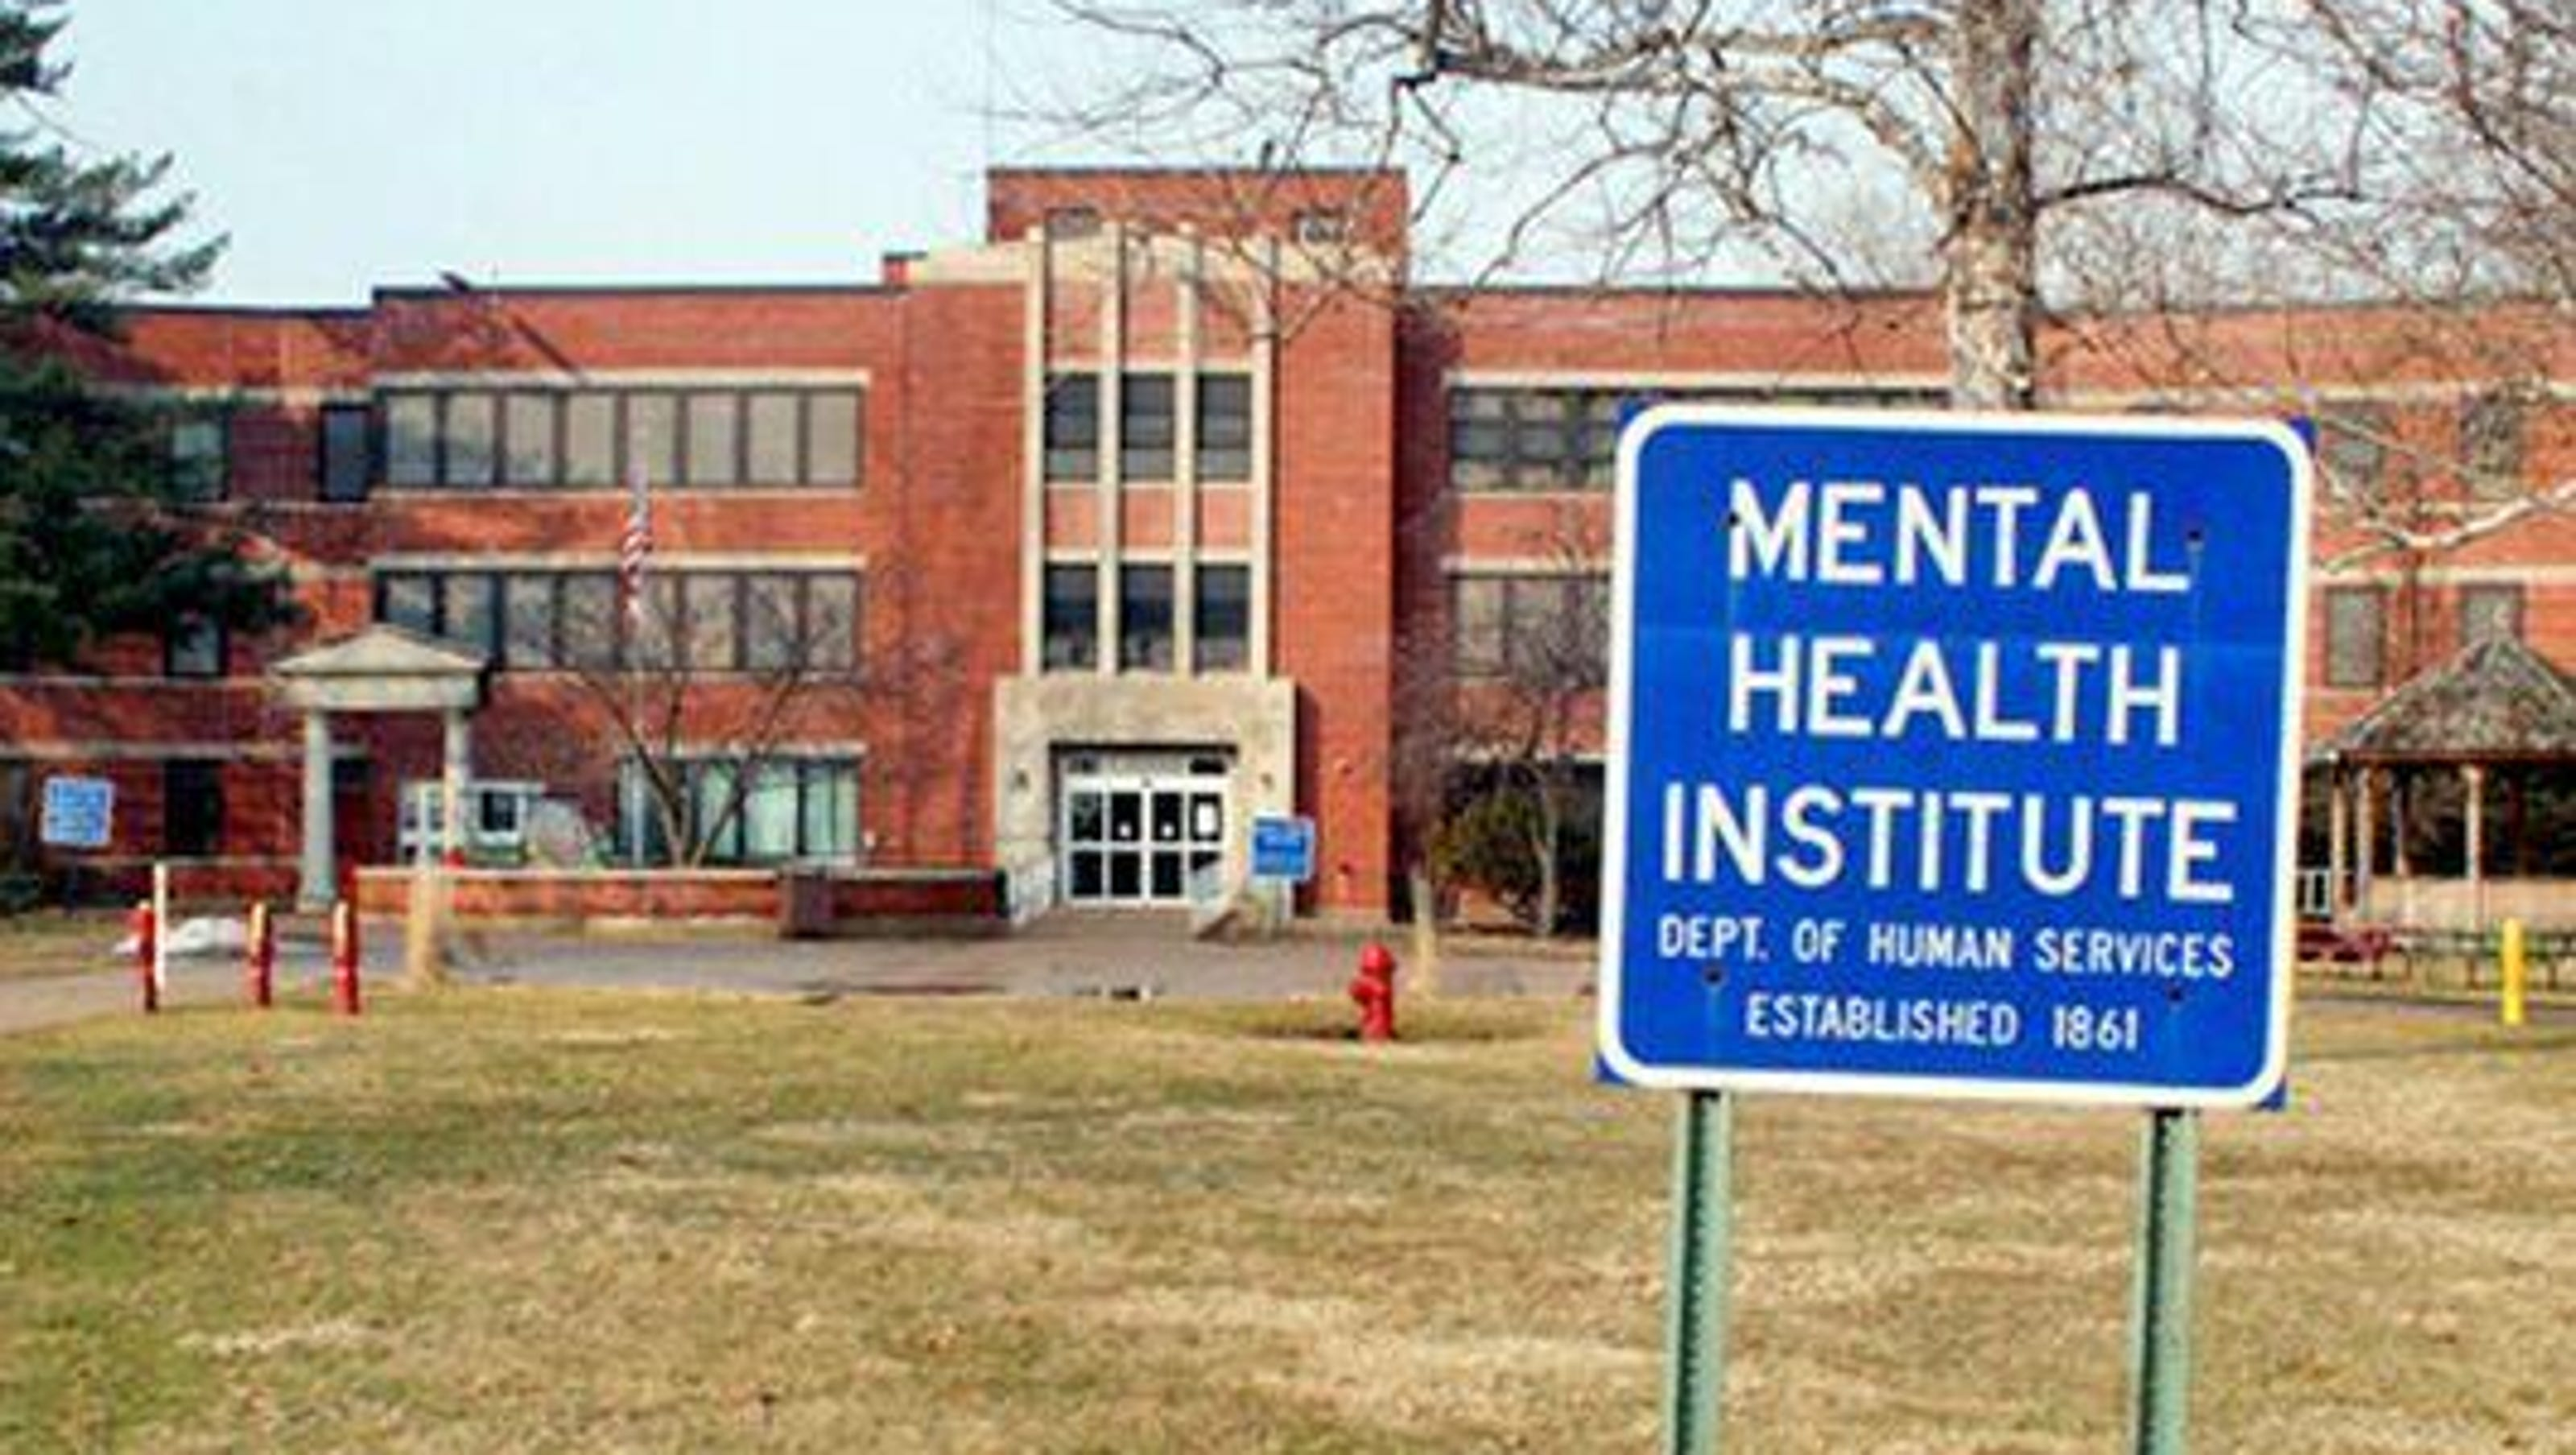 Iowa S Mental Health System Draws Deep Disapproval New Iowa Poll Shows